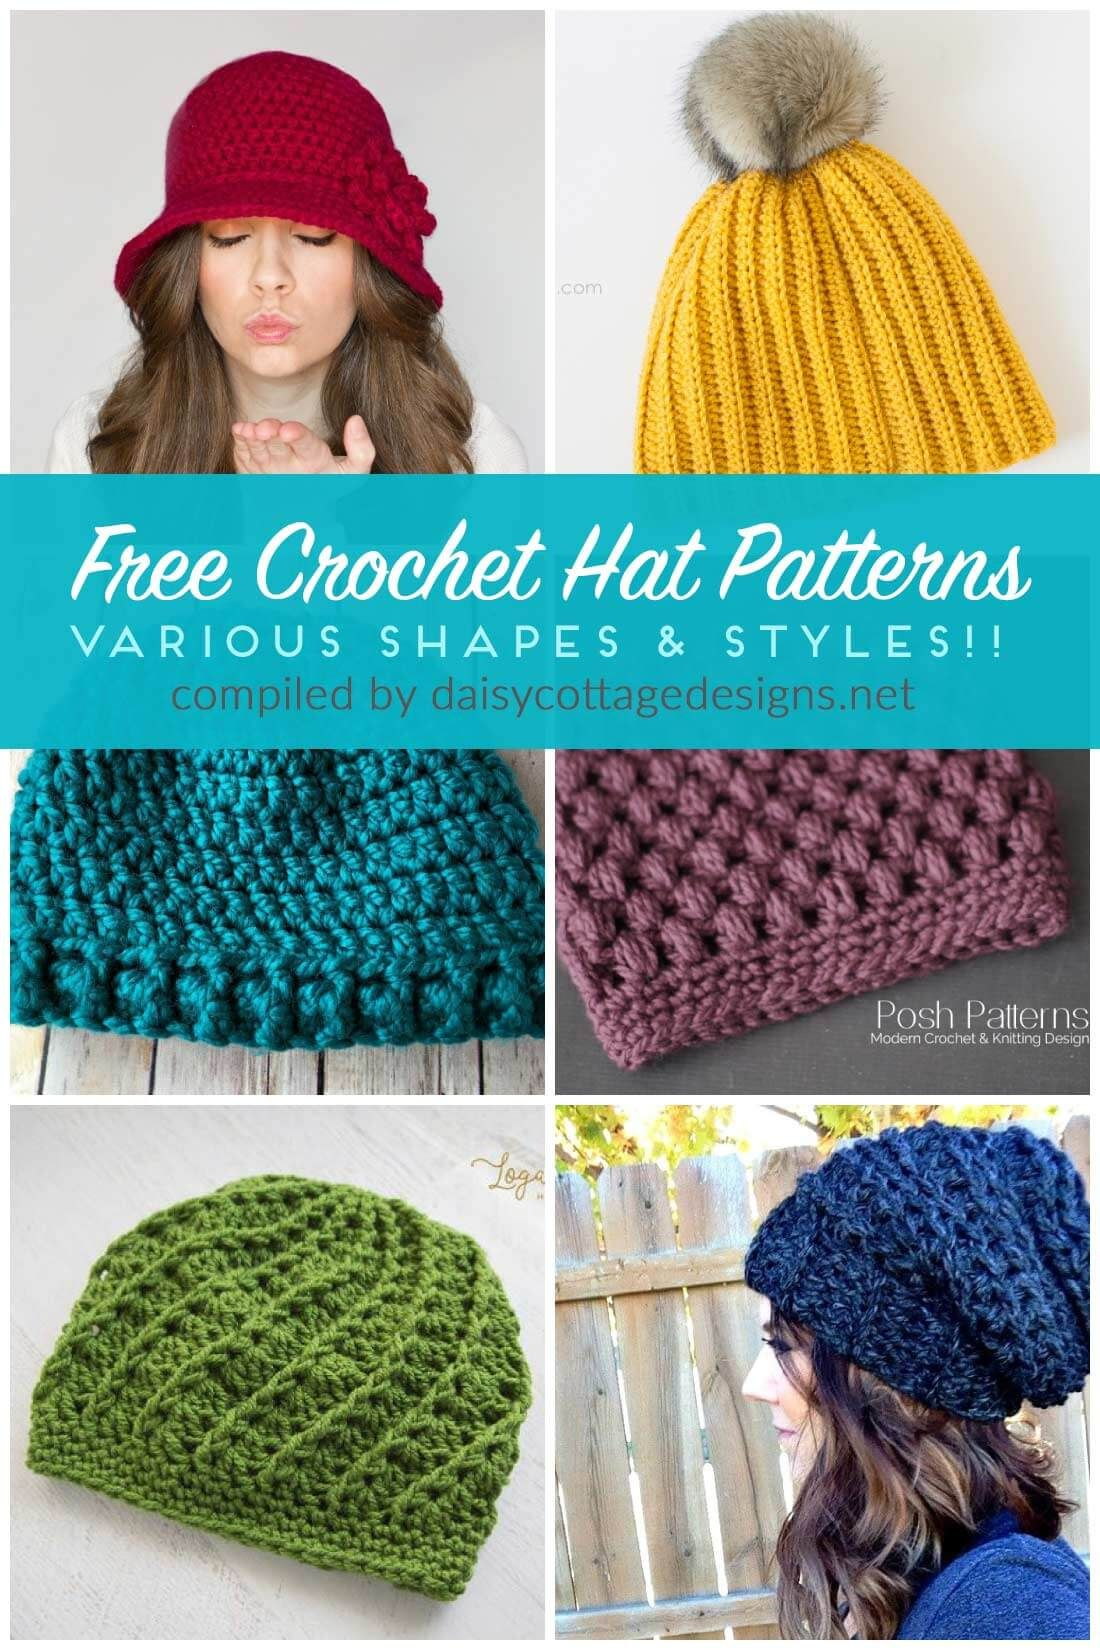 Free Crochet Hat Patterns | Free crochet hat patterns, Cottage ...